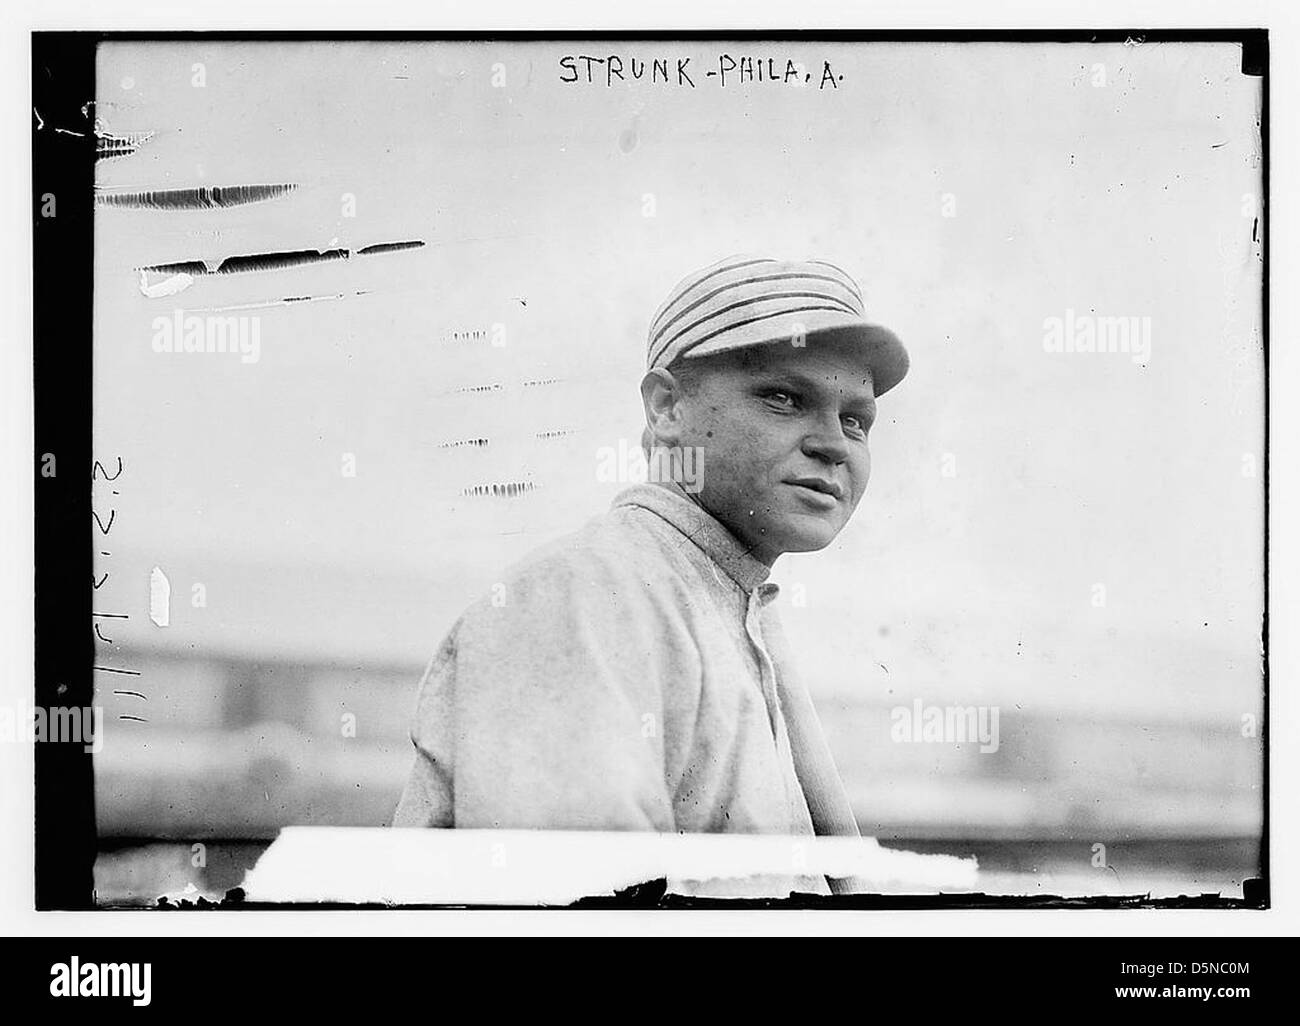 [Amos Strunk, Philadelphia, AL (baseball)] (LOC) Immagini Stock